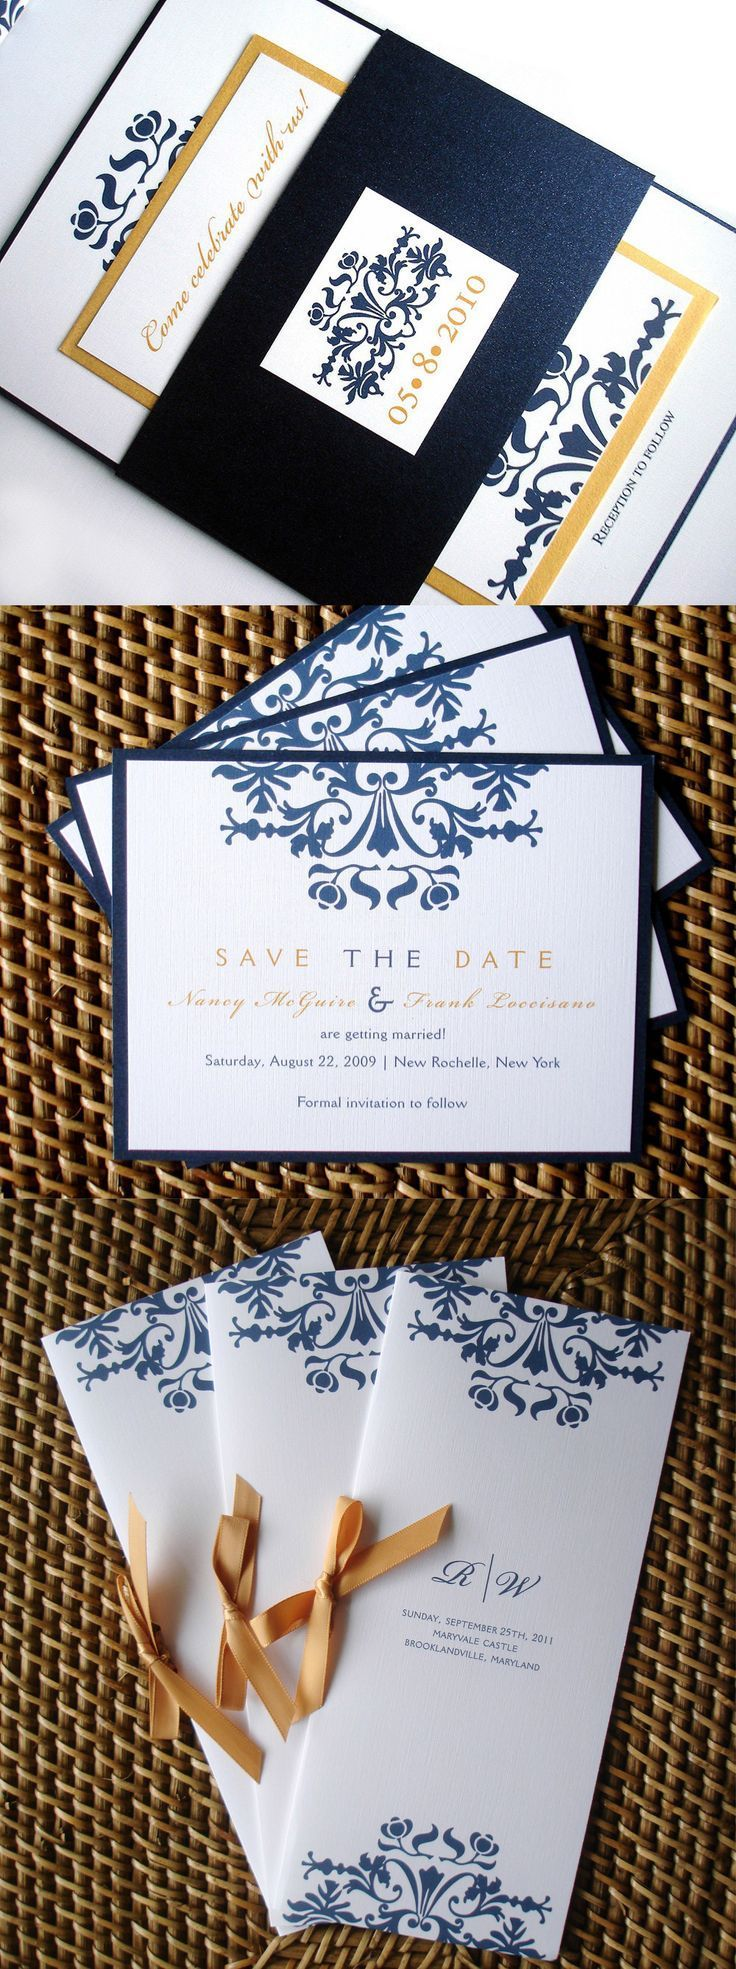 Gold and navy blue wedding invitation set elegant wedding